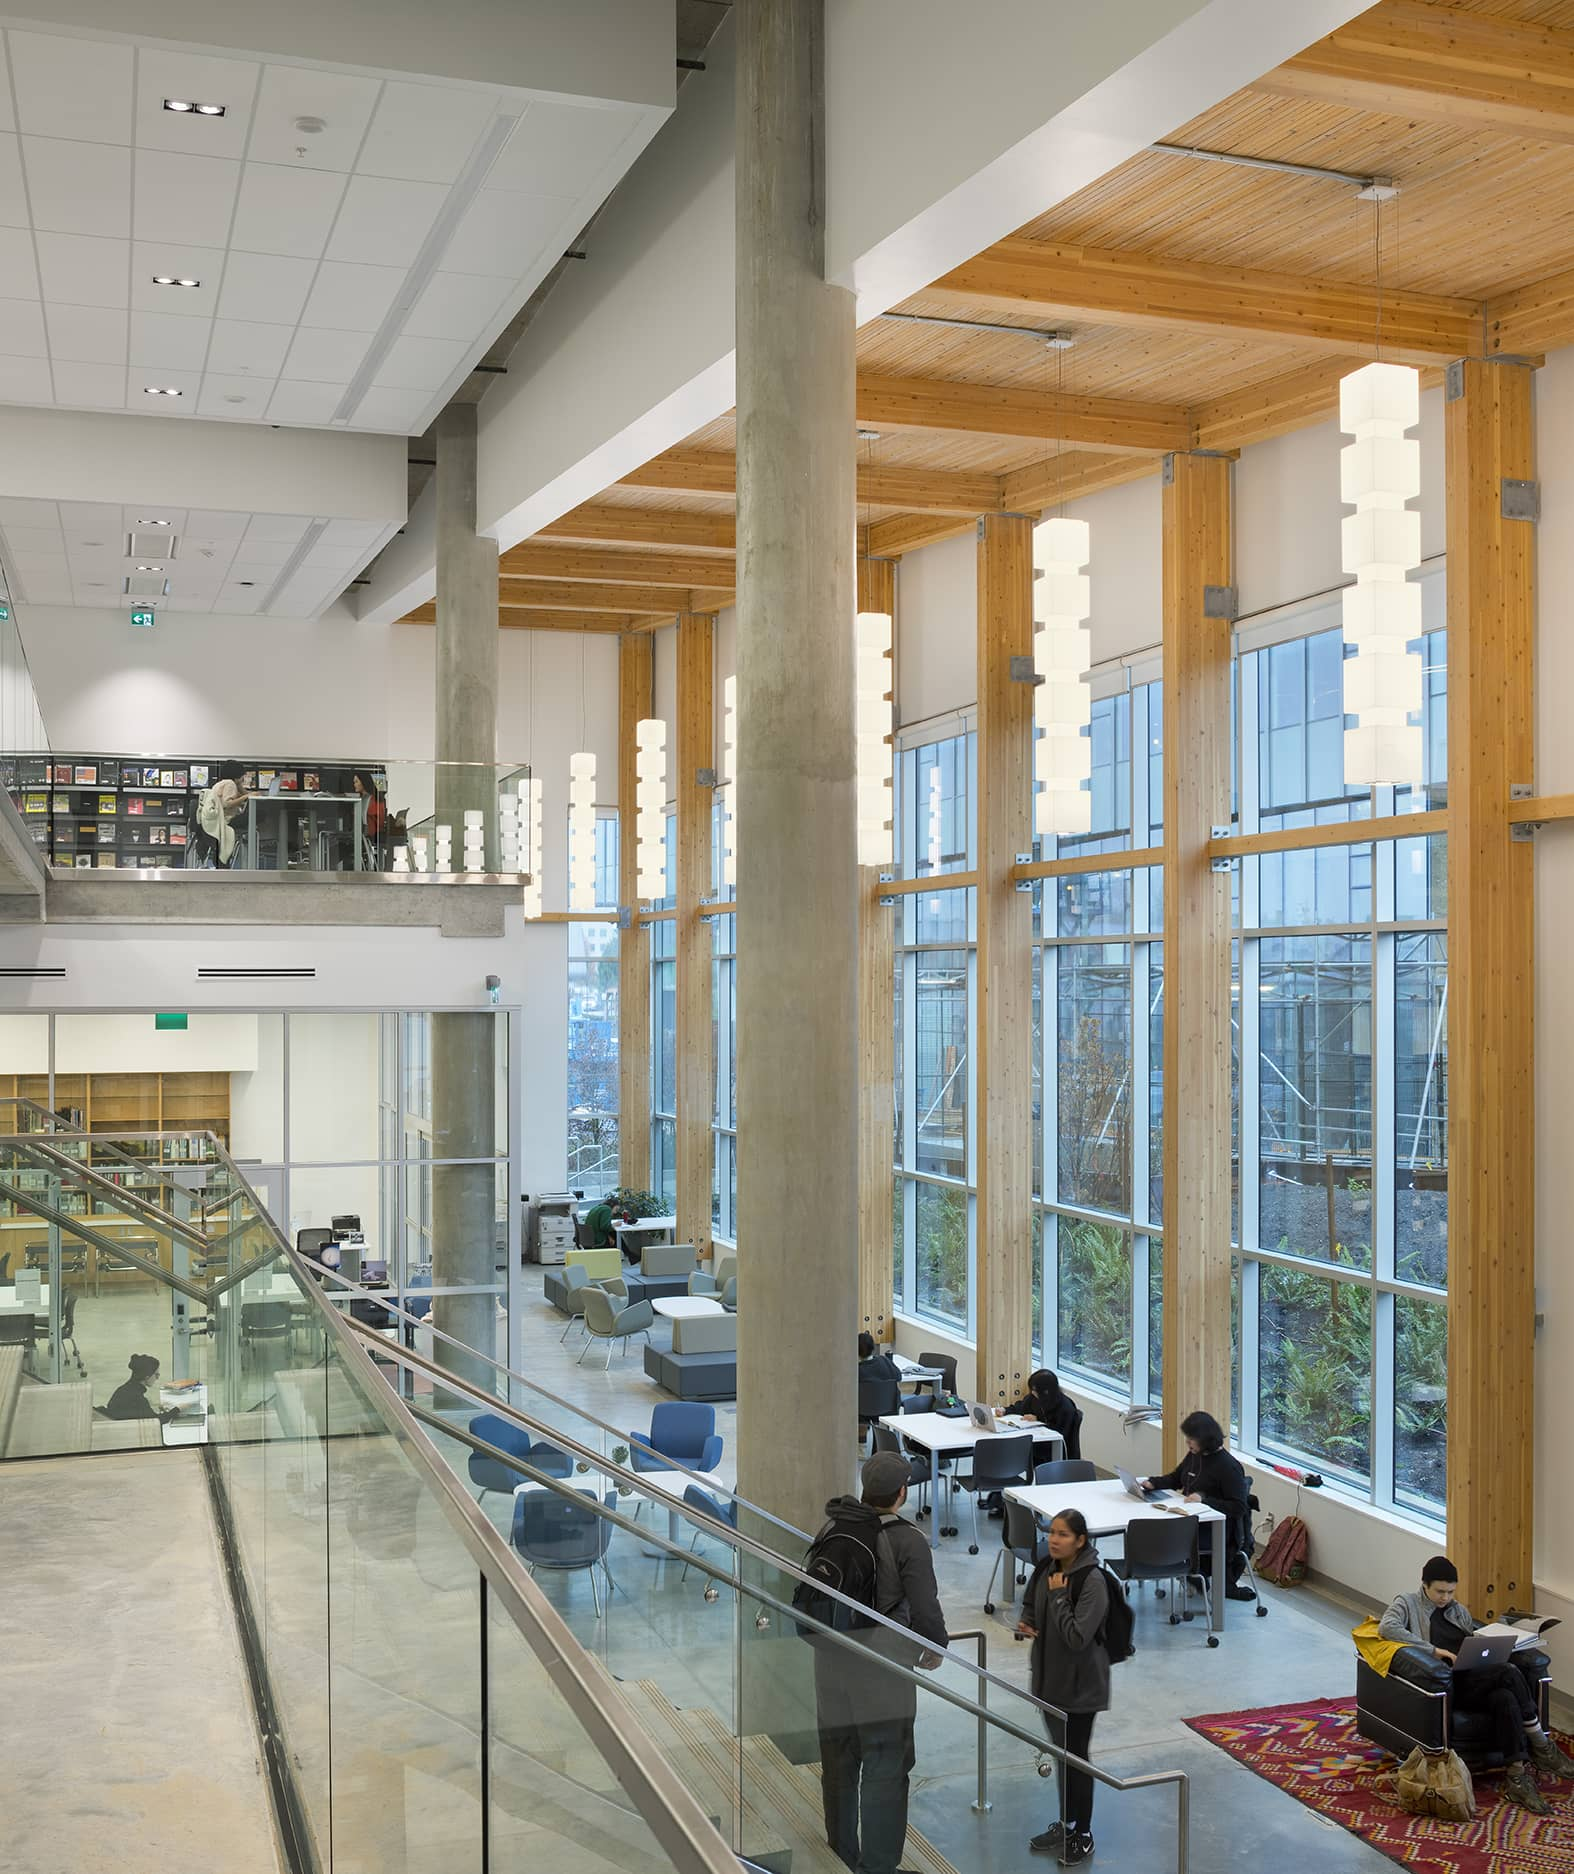 bbp emily carr university of art + design common area 2